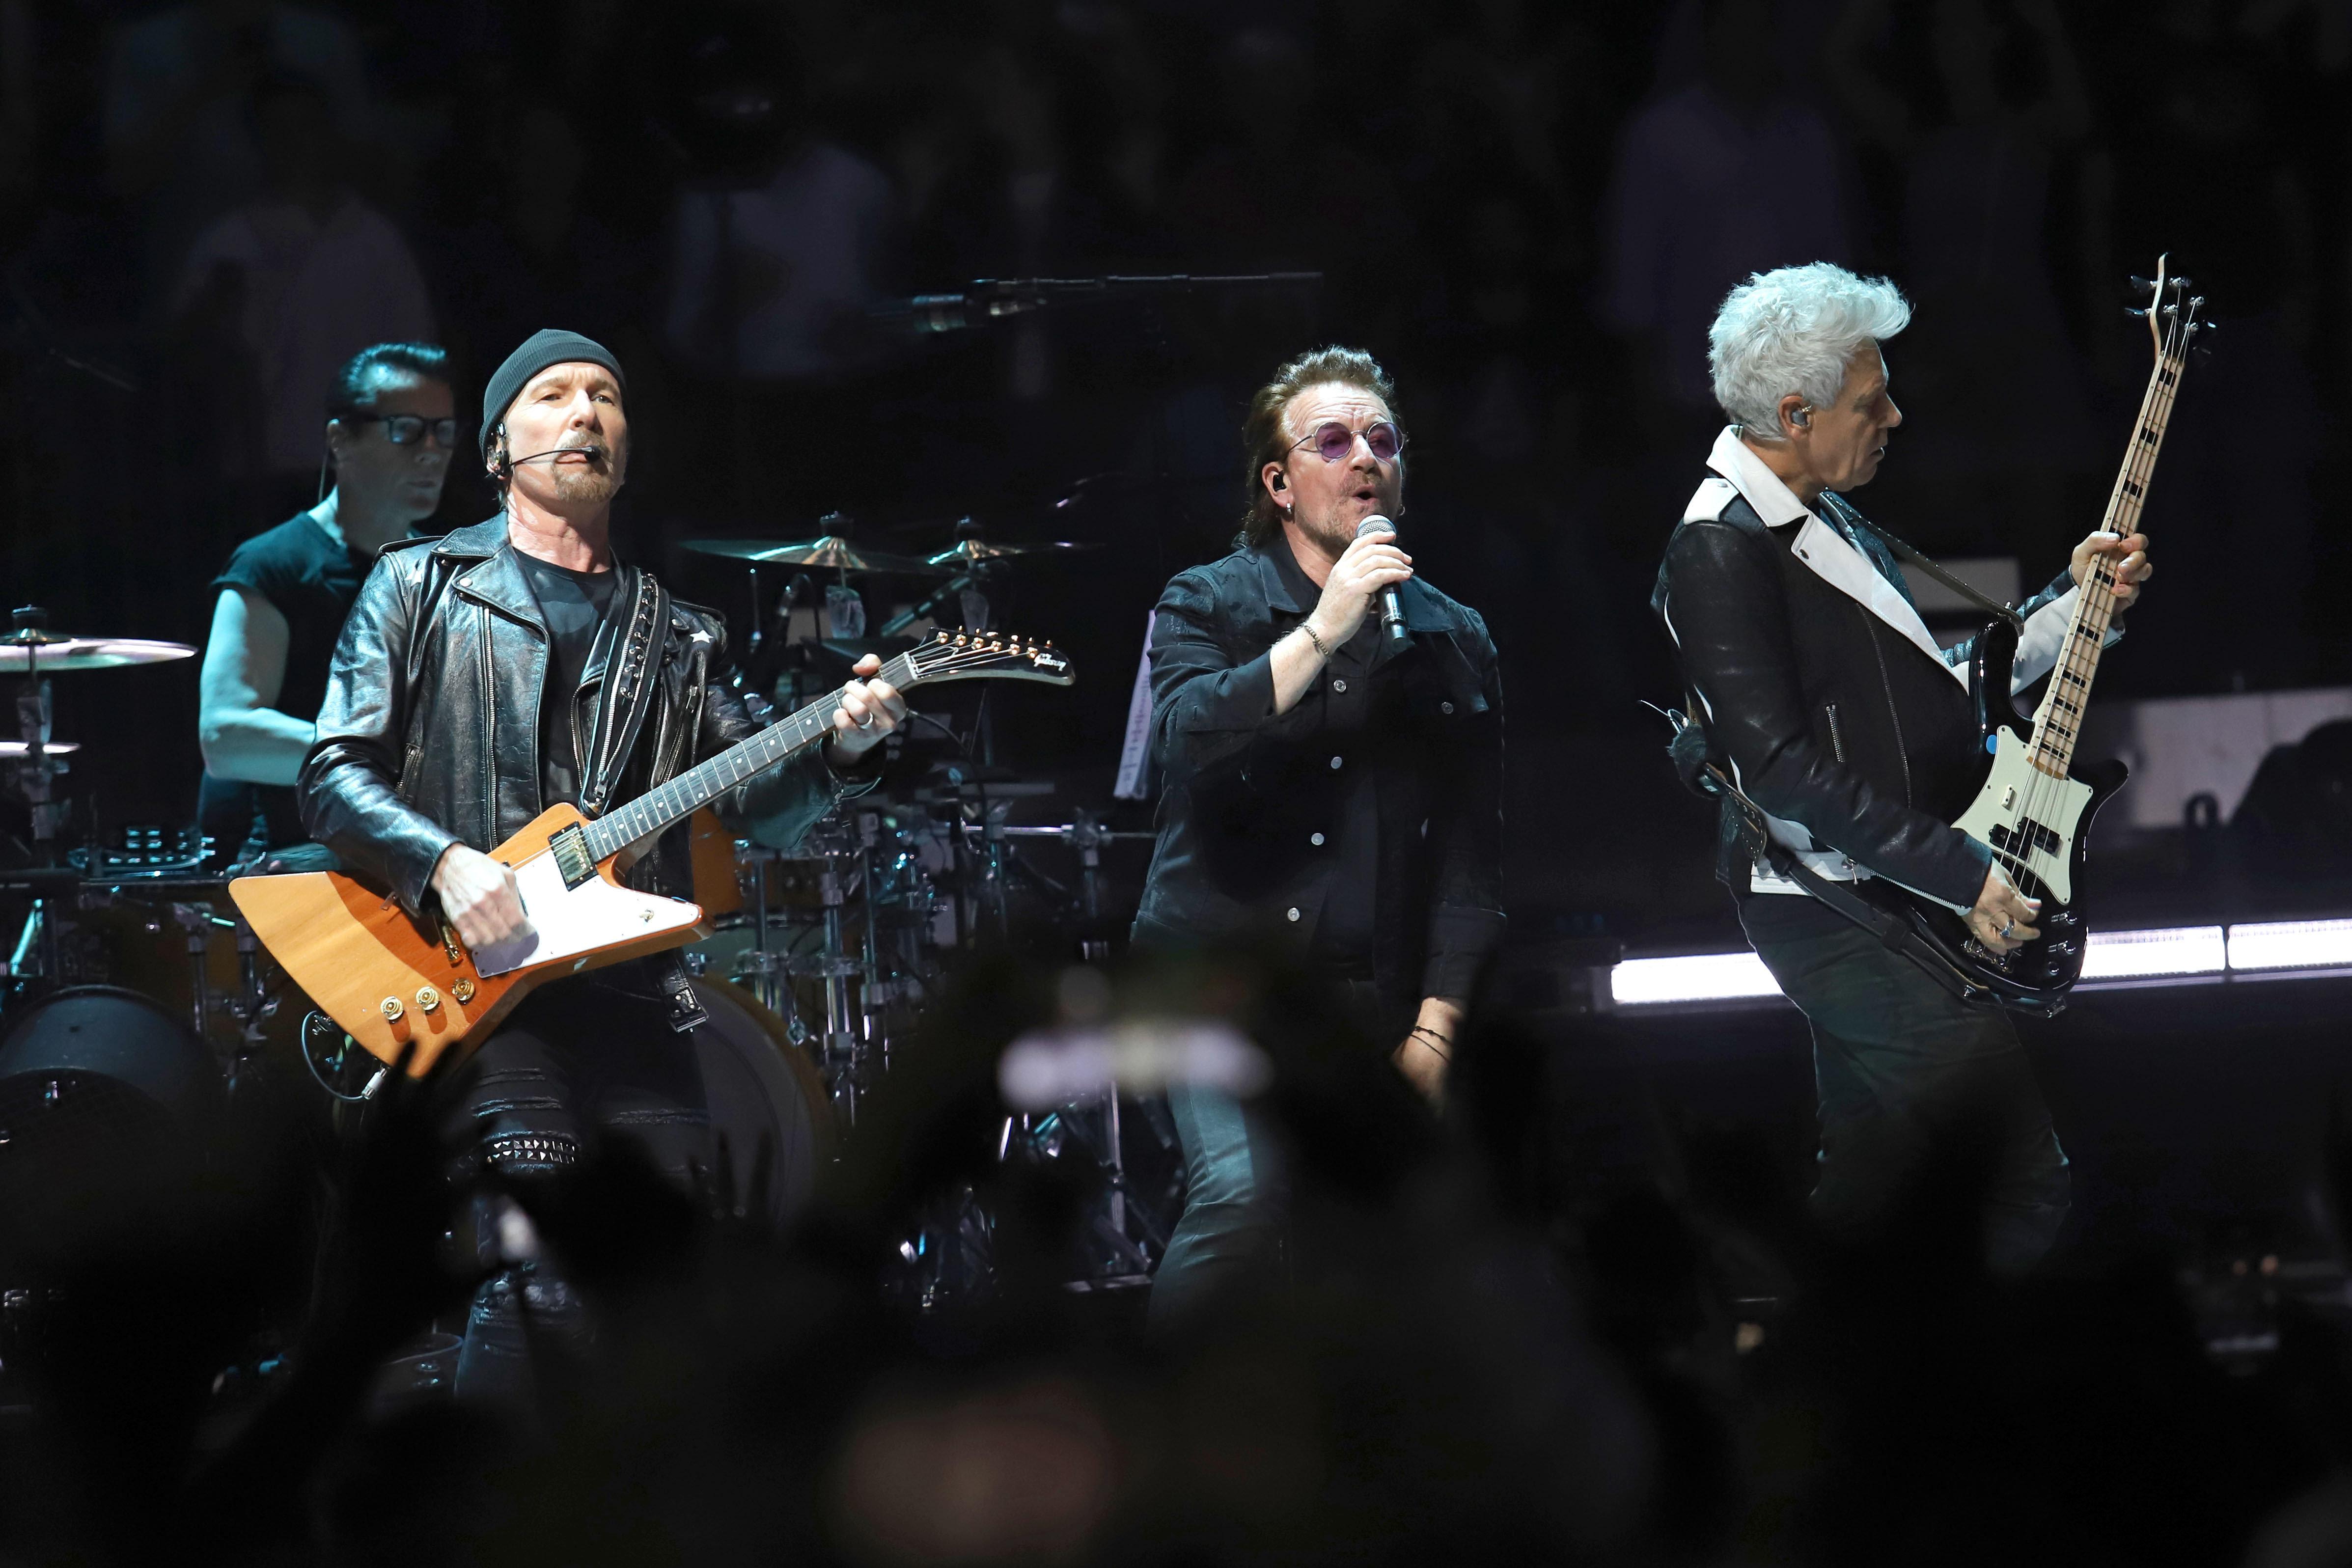 Bono Promises To Finish U2 Tour After Losing